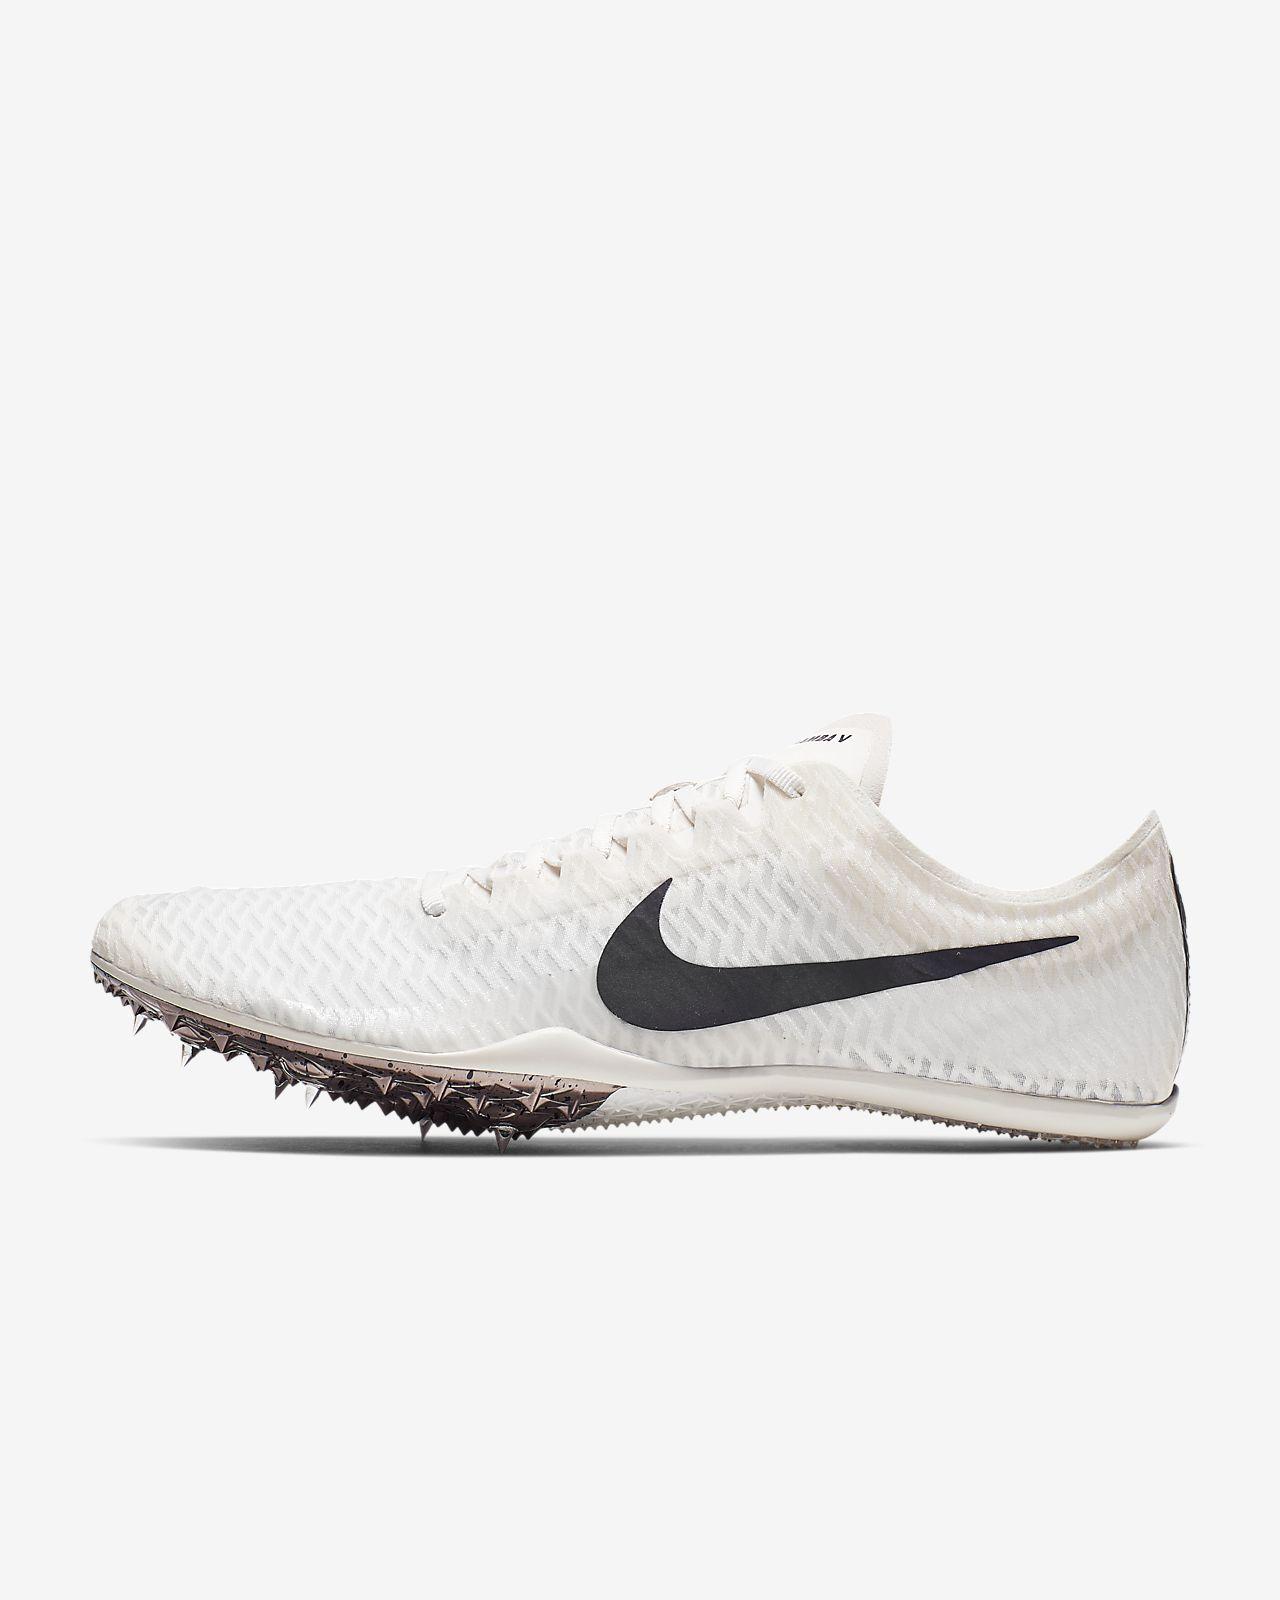 Calzado de running Nike Zoom Mamba 5